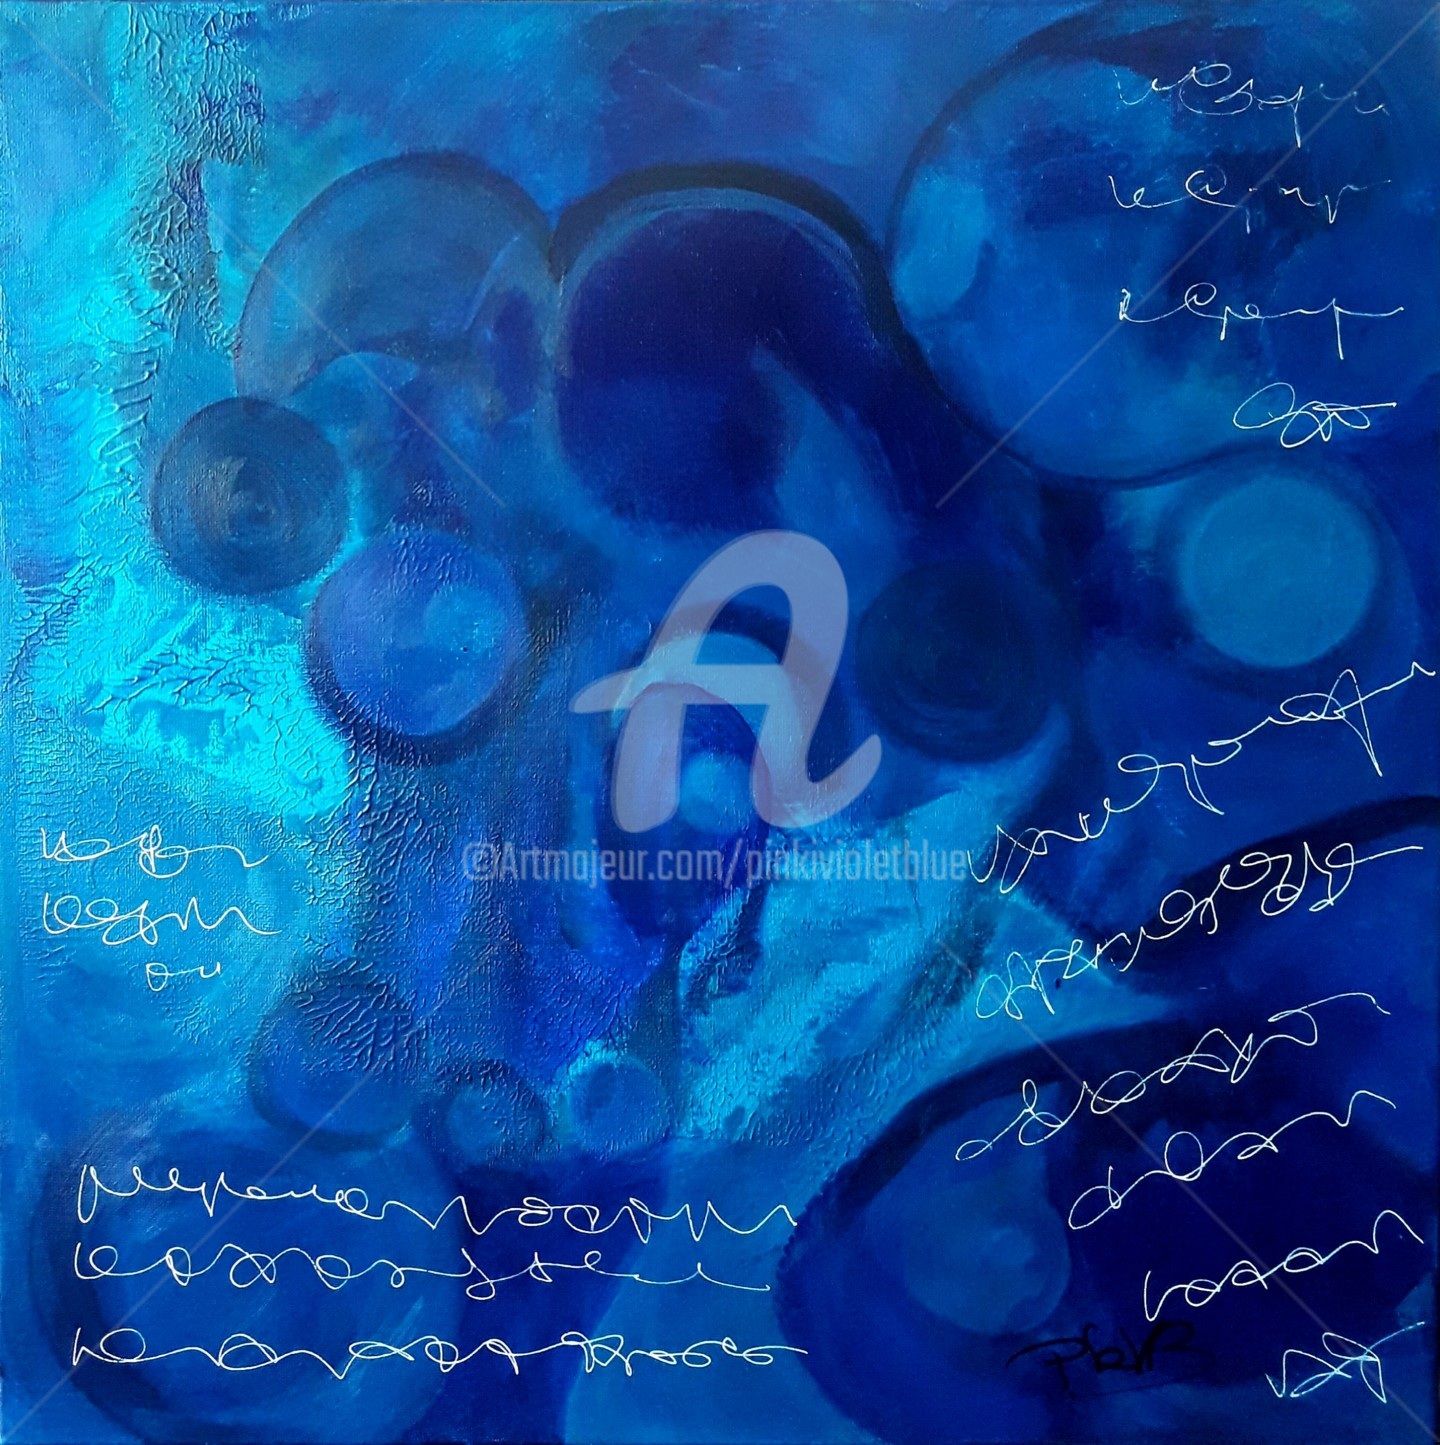 Pinkivioletblue - Circonvolutions bleues 6